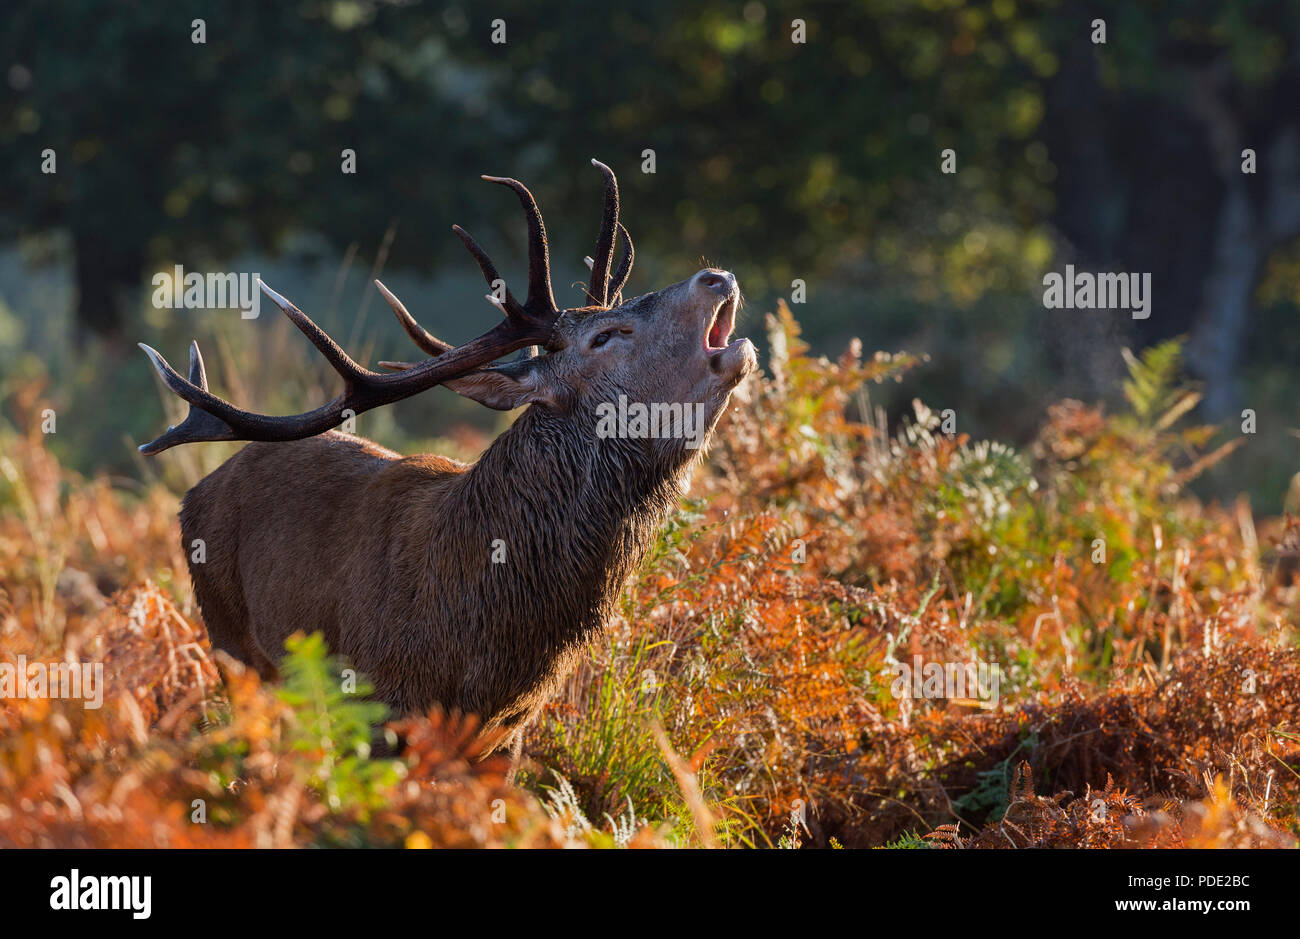 Ciervo ciervo rugido de Richmond Park UK Foto de stock